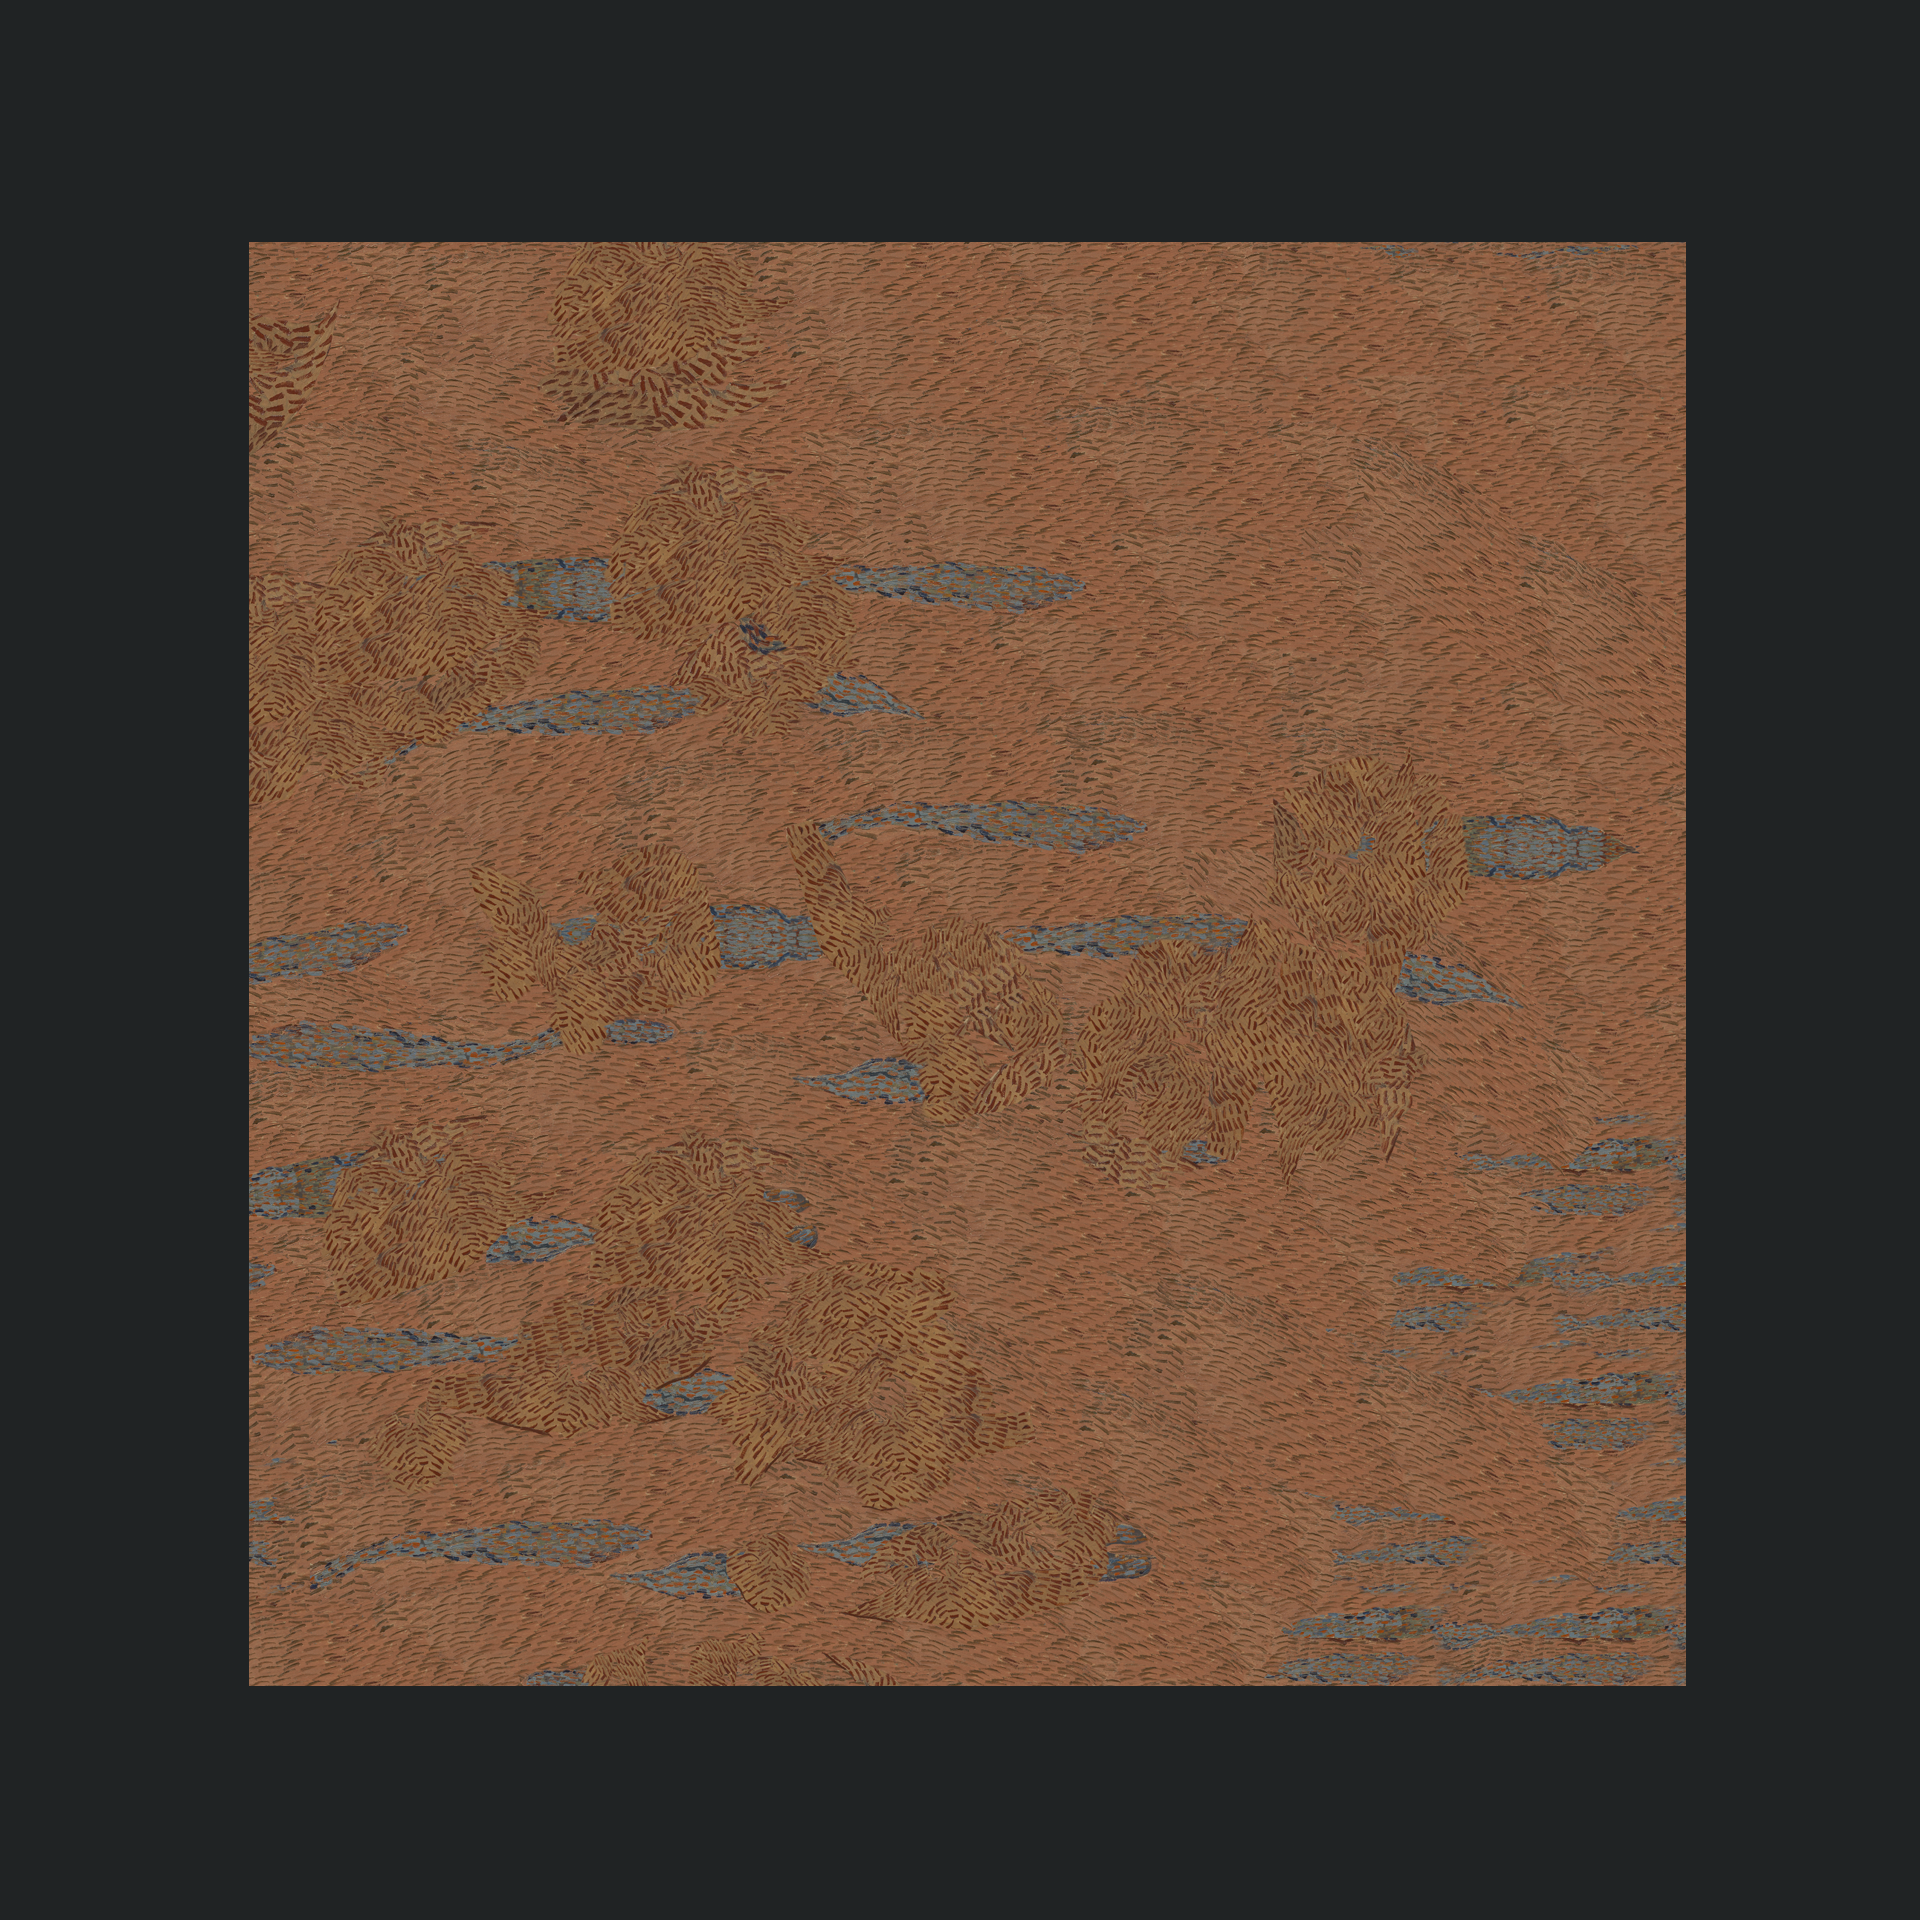 textures_saint_remy_floor.png